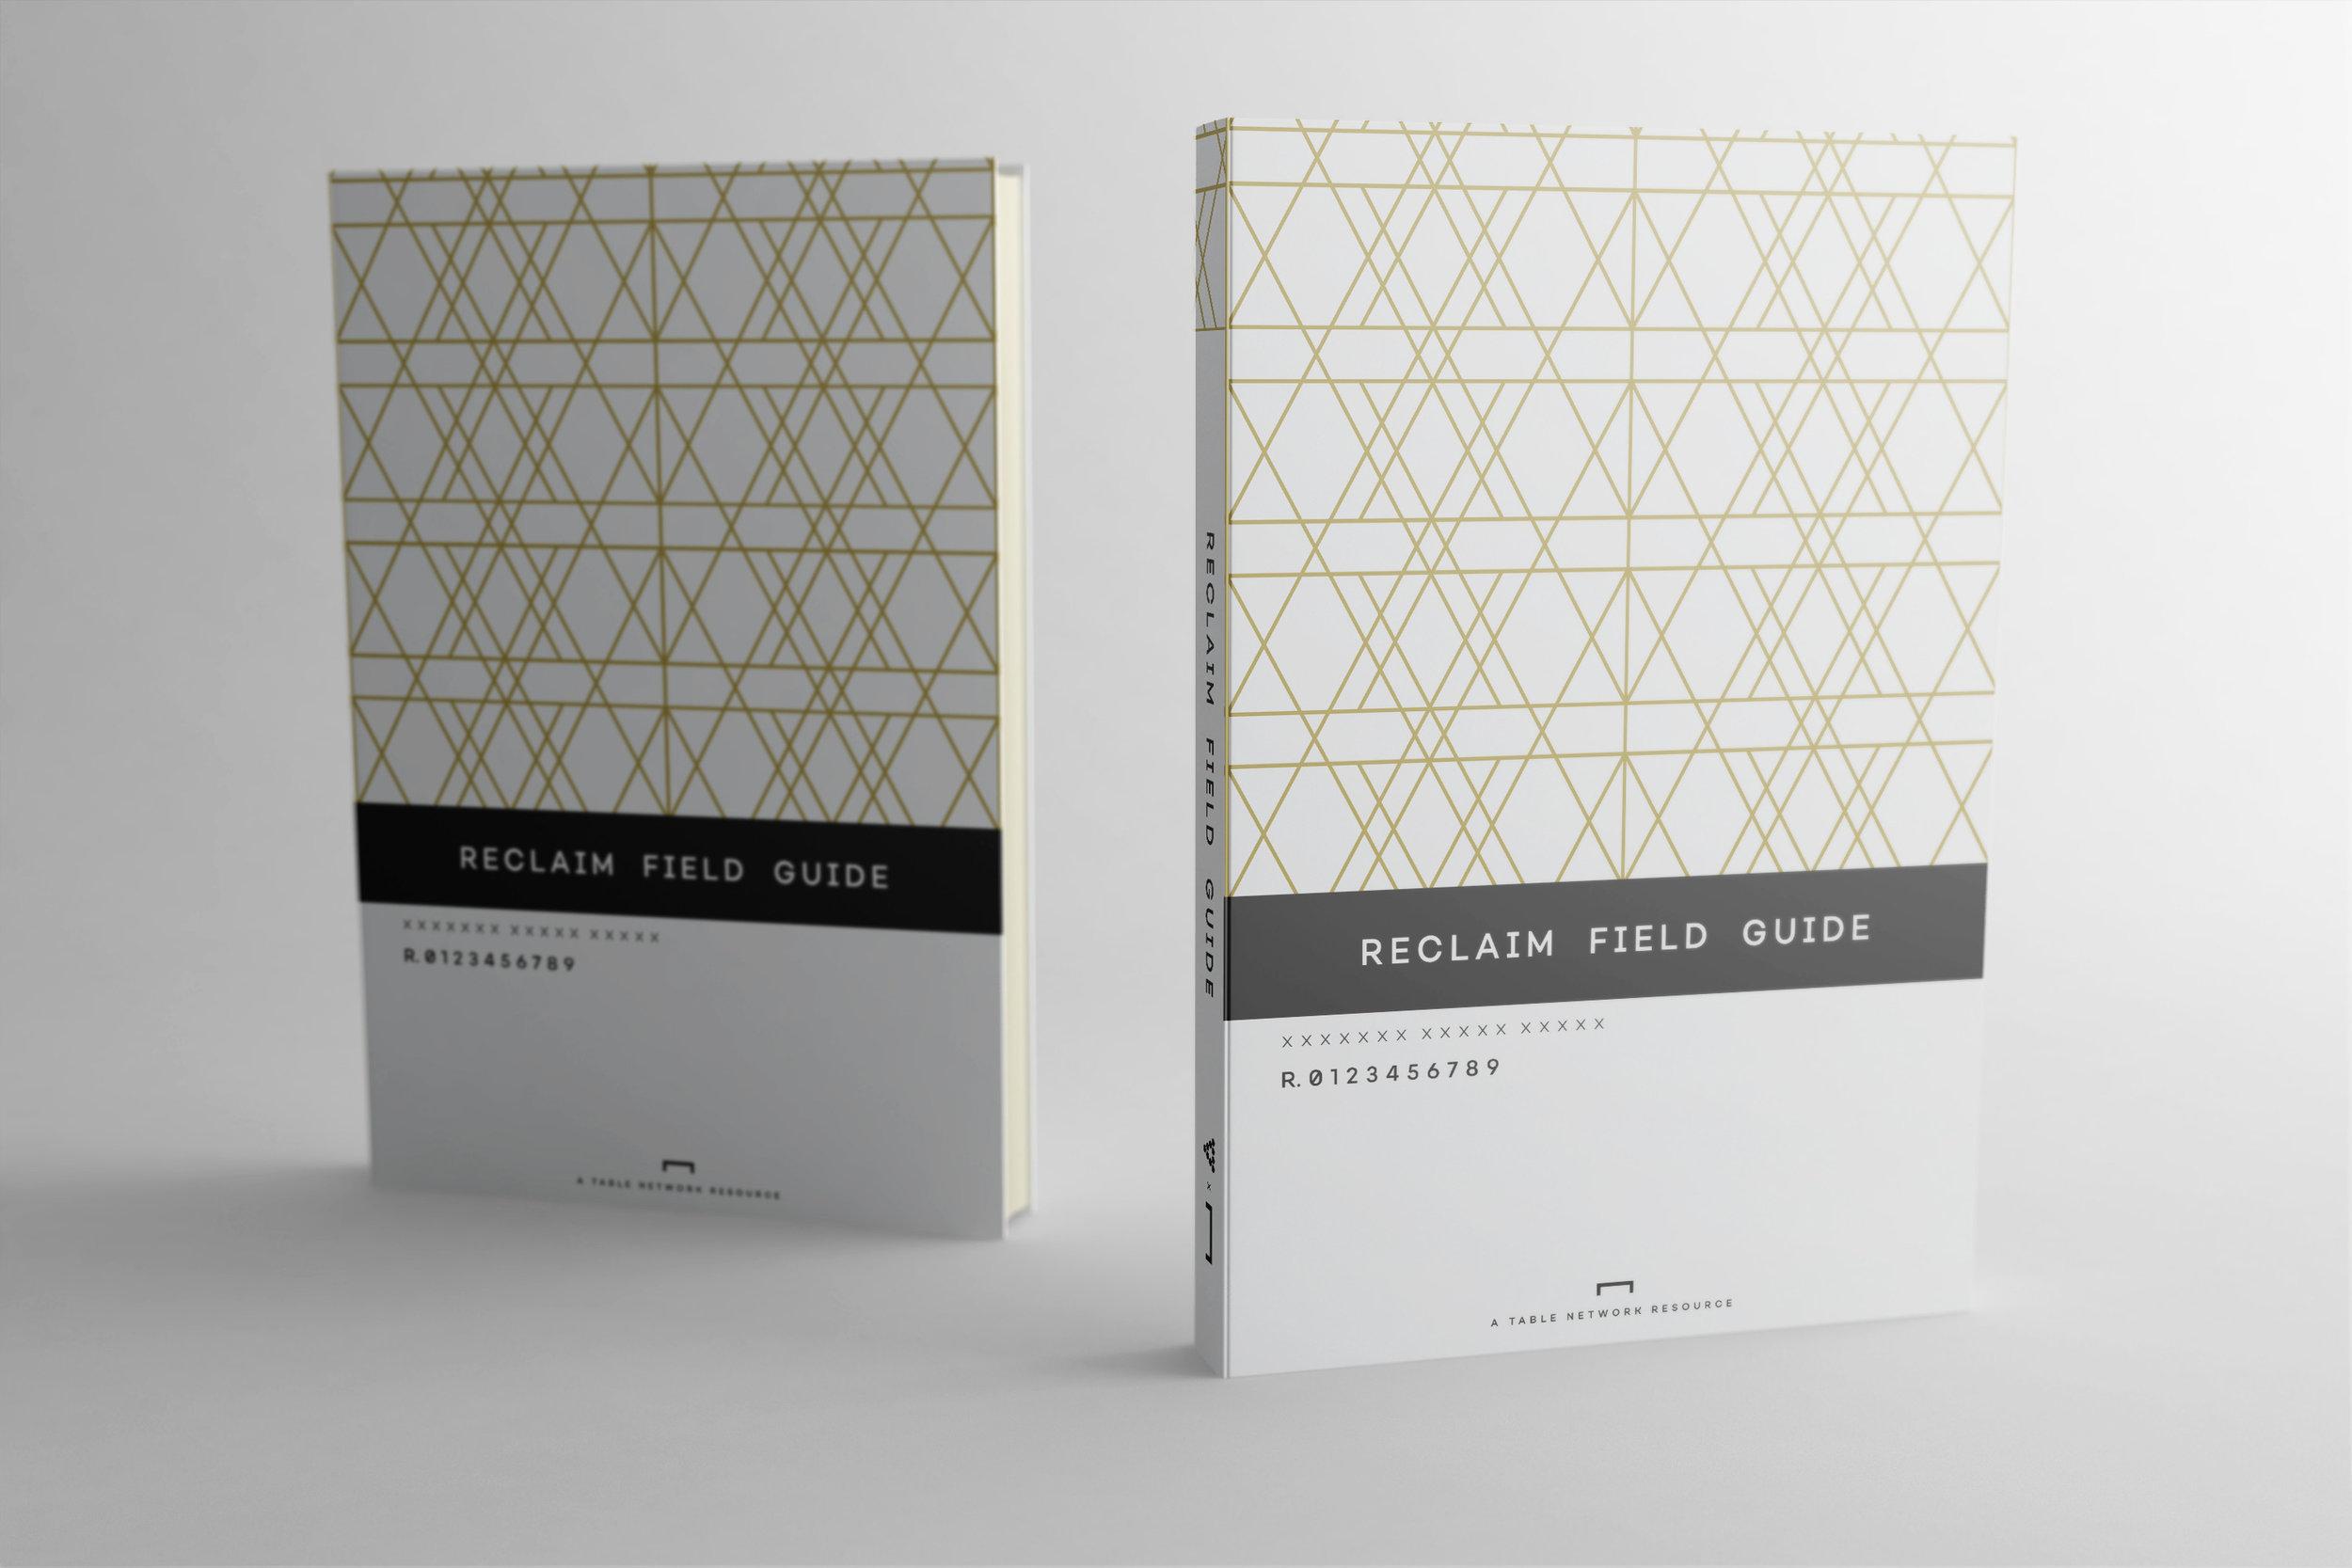 reclaim-field-guide-mockup.jpeg